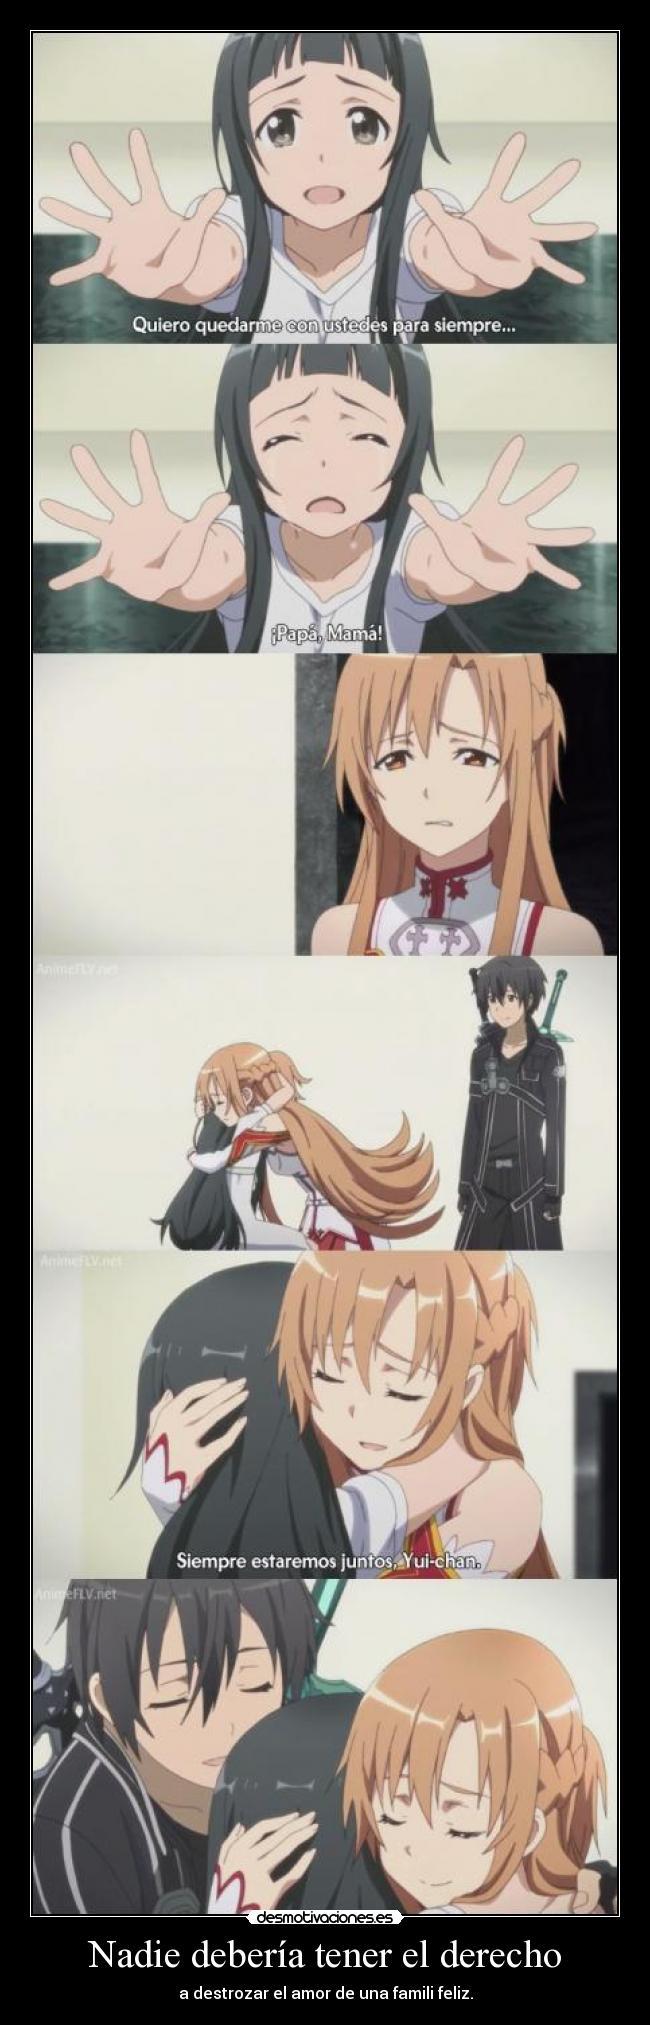 carteles raptorhunters nigatsu harukaze anime sword art online sao kirito asuna yui son una familia amor desmotivaciones